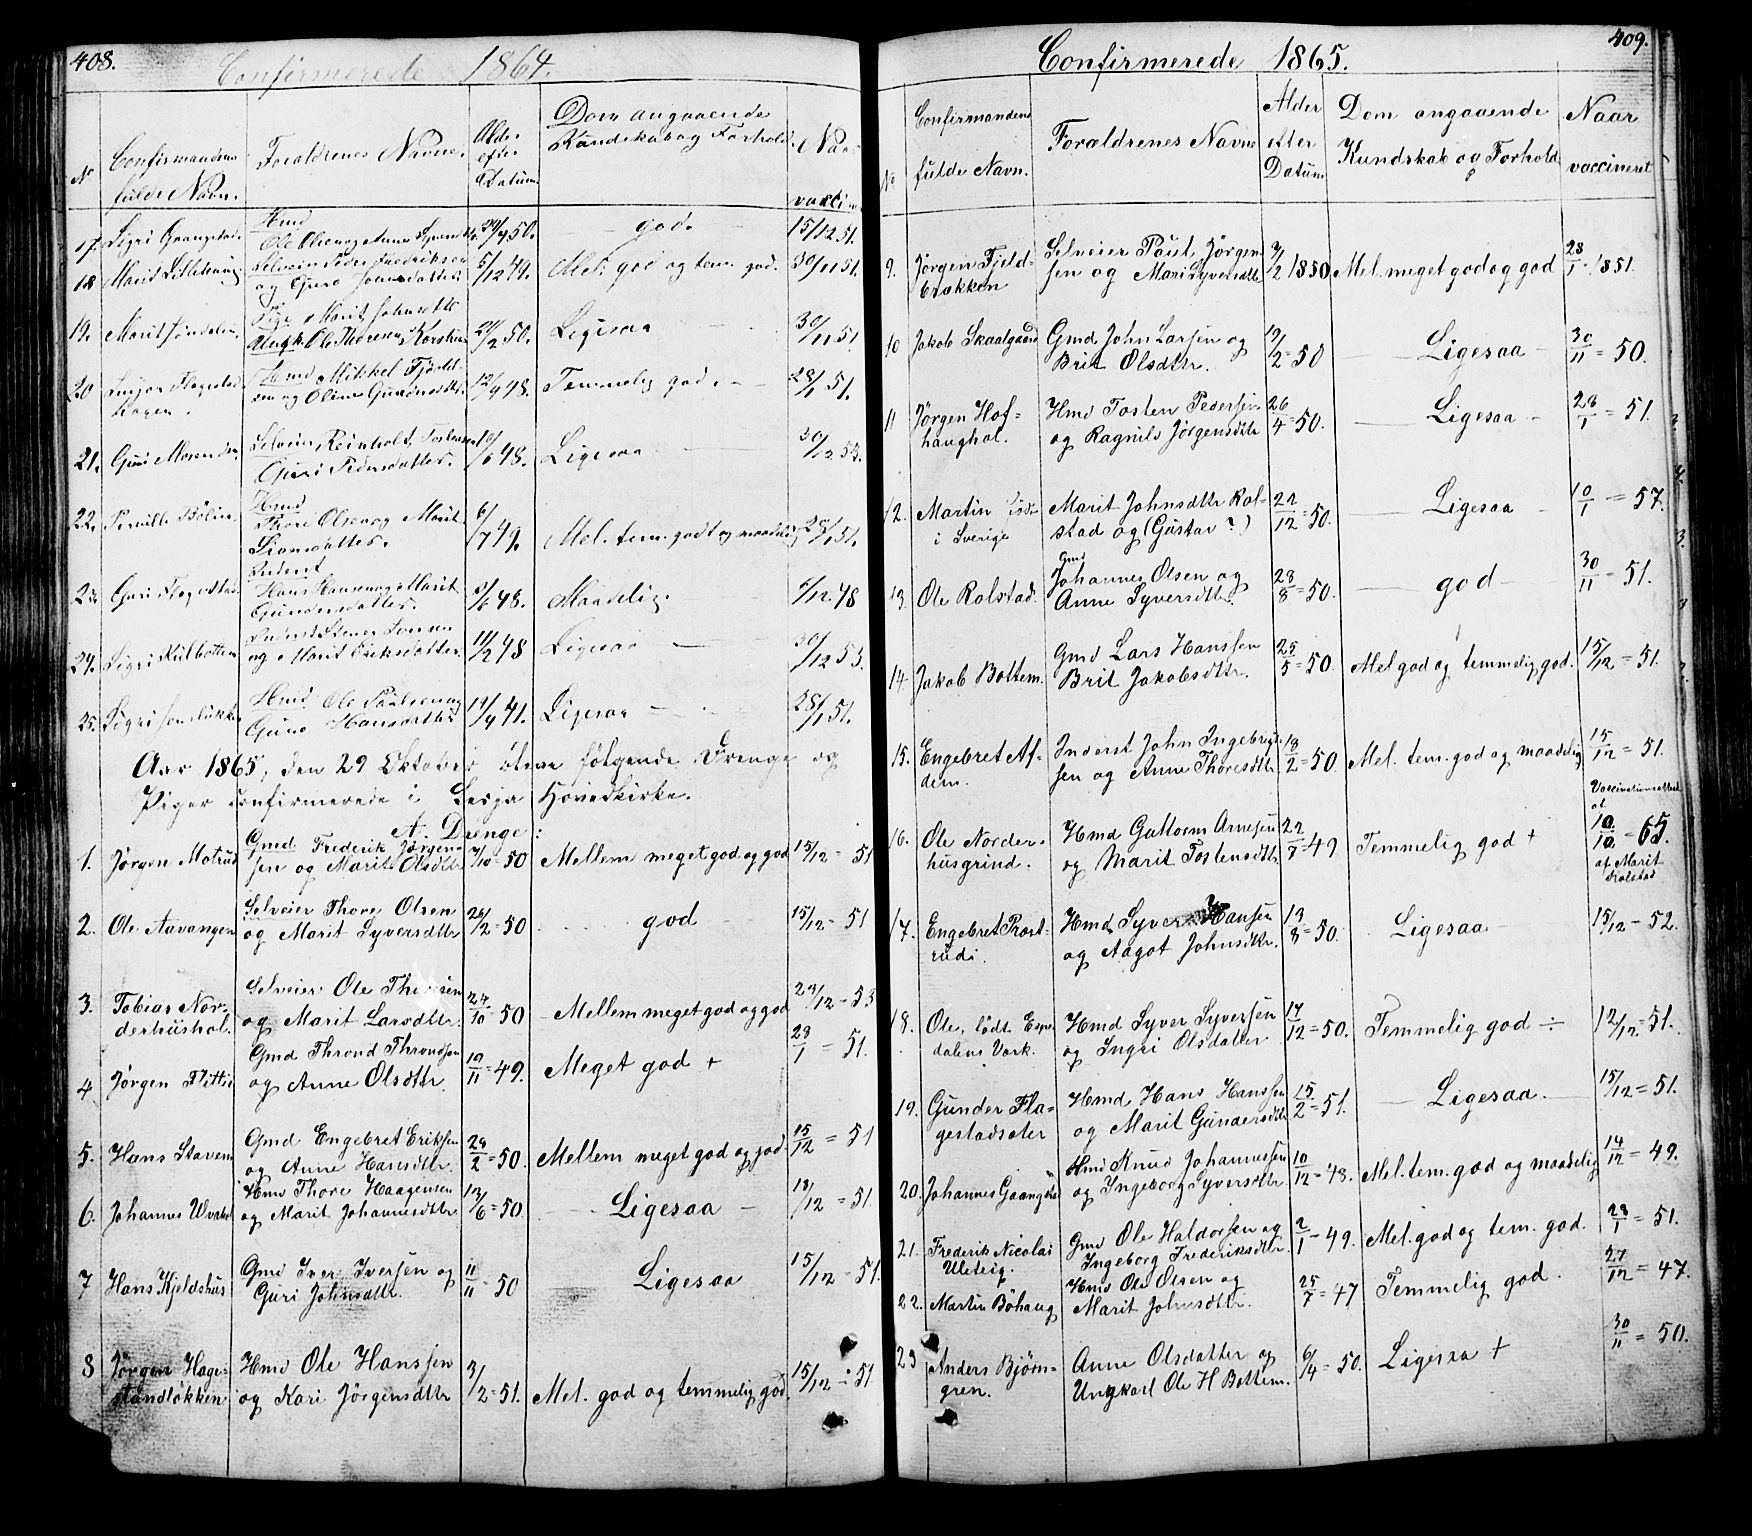 SAH, Lesja prestekontor, Klokkerbok nr. 5, 1850-1894, s. 408-409